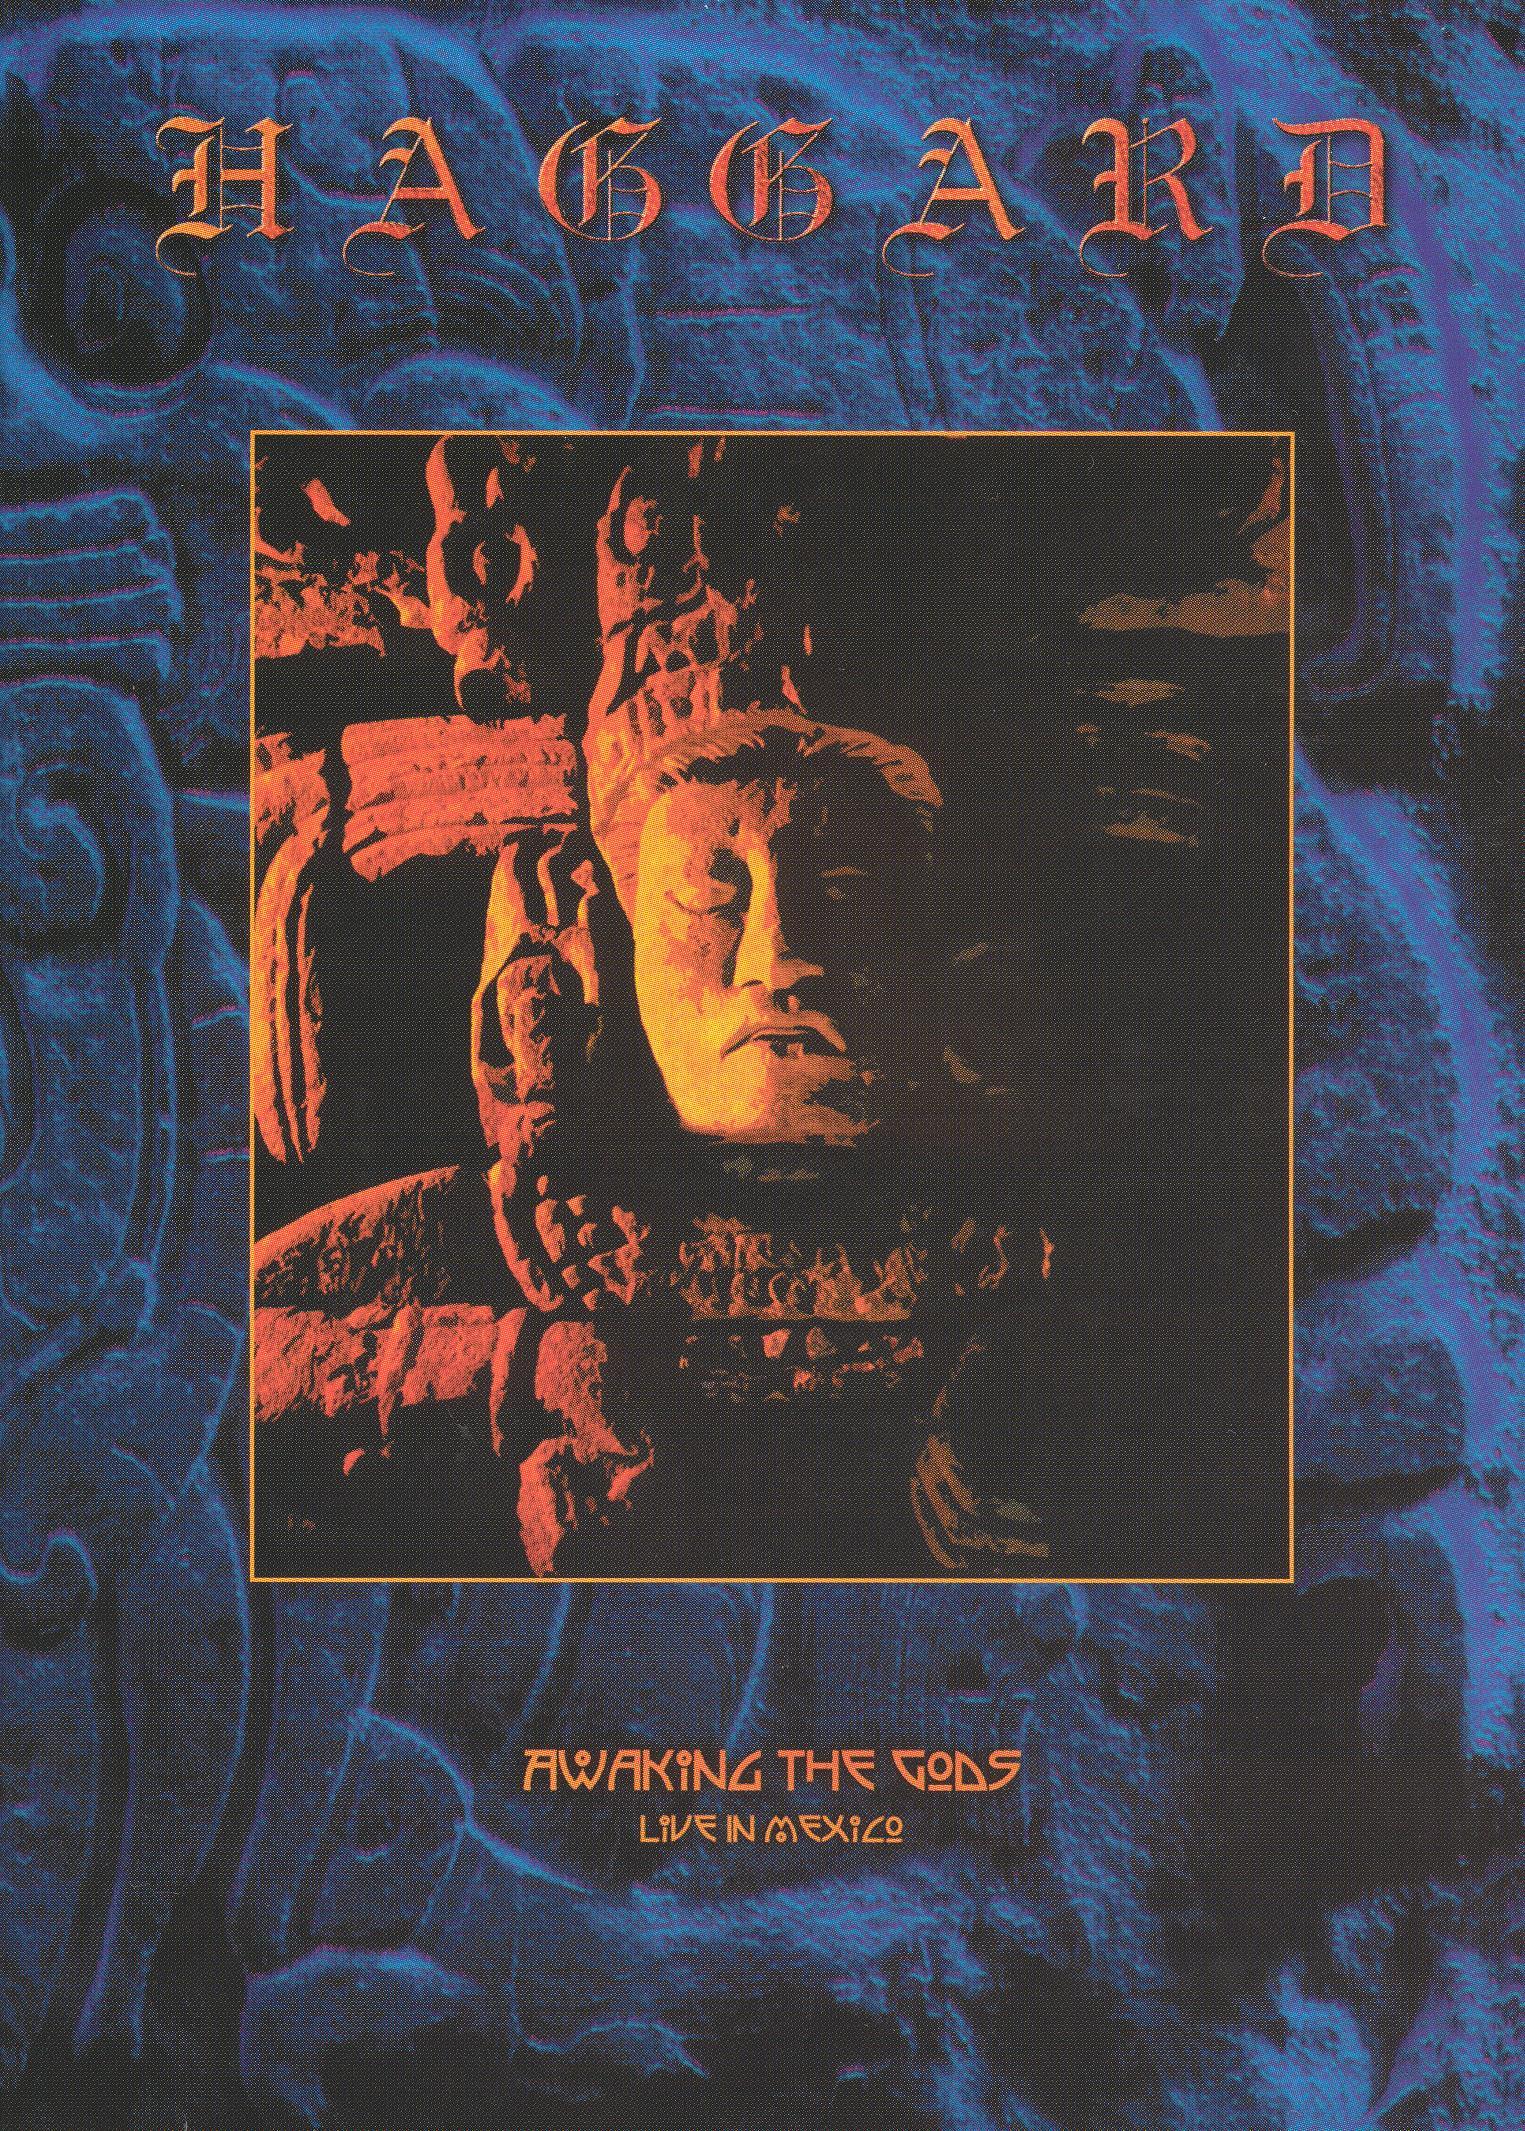 Haggard: Awakening the Gods - Live in Mexico